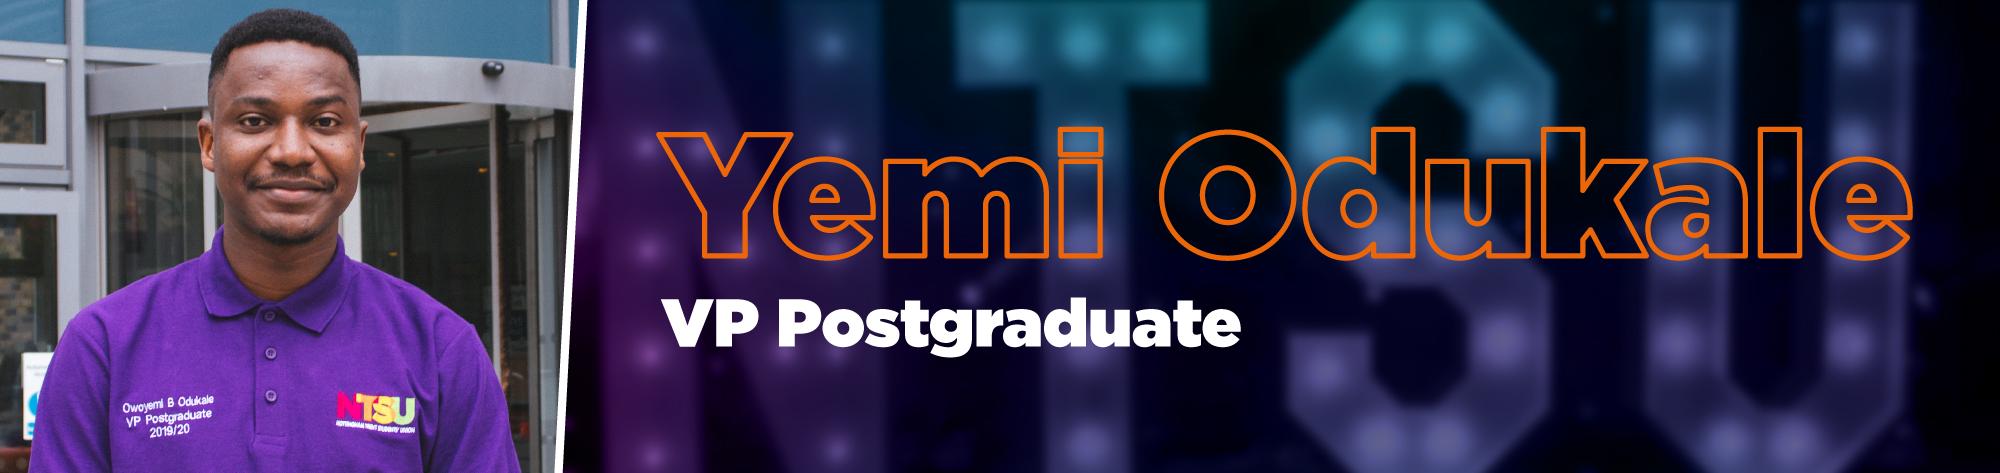 Yemi Odukale - VP Postgraduate